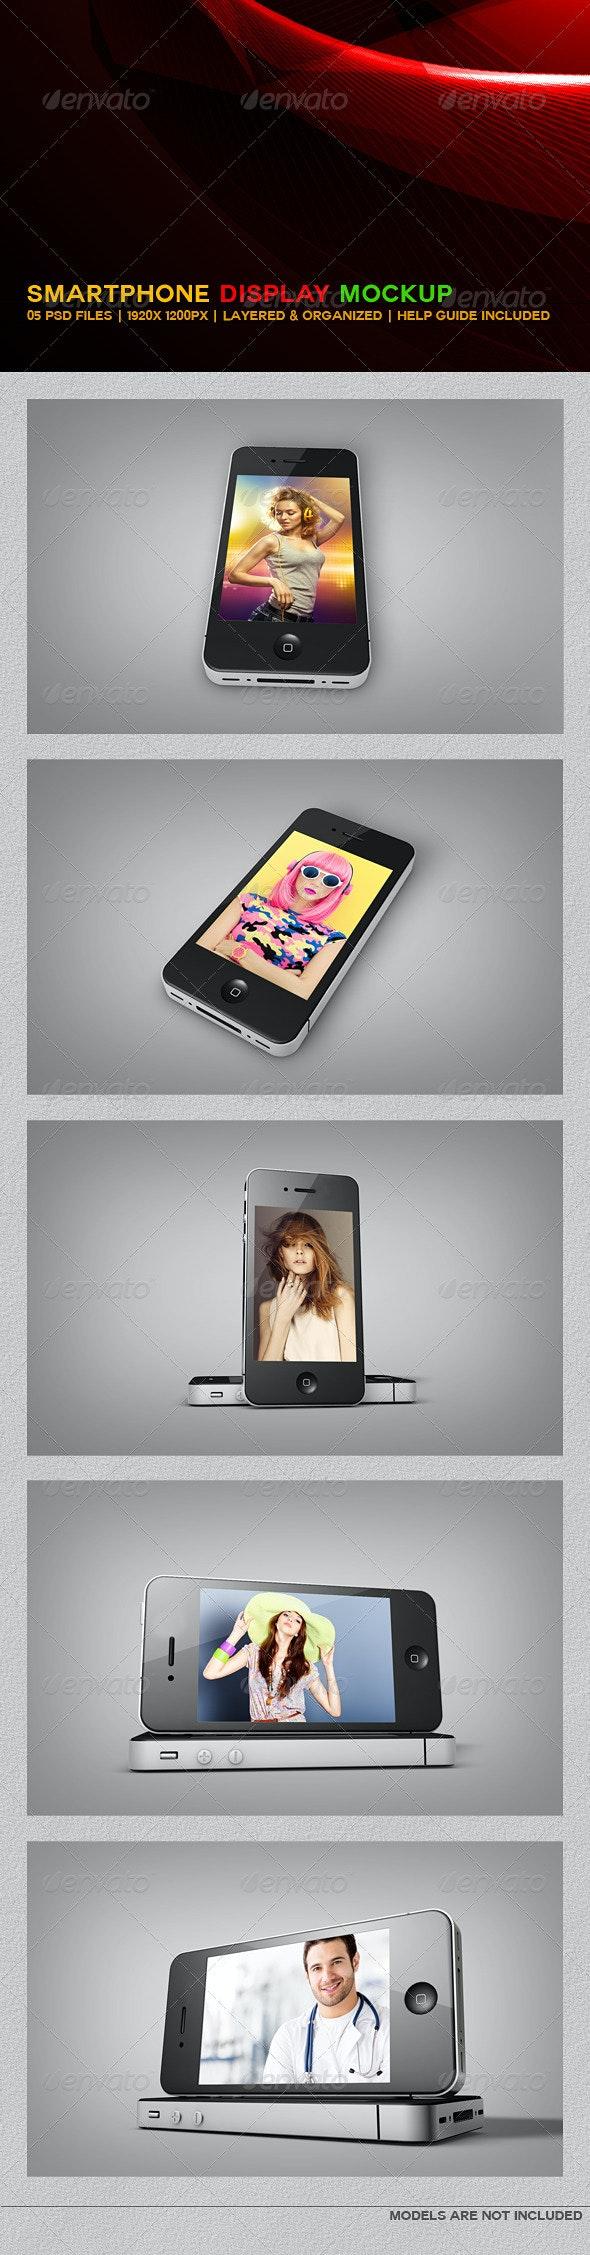 SmartPhone Display MockUP - Mobile Displays